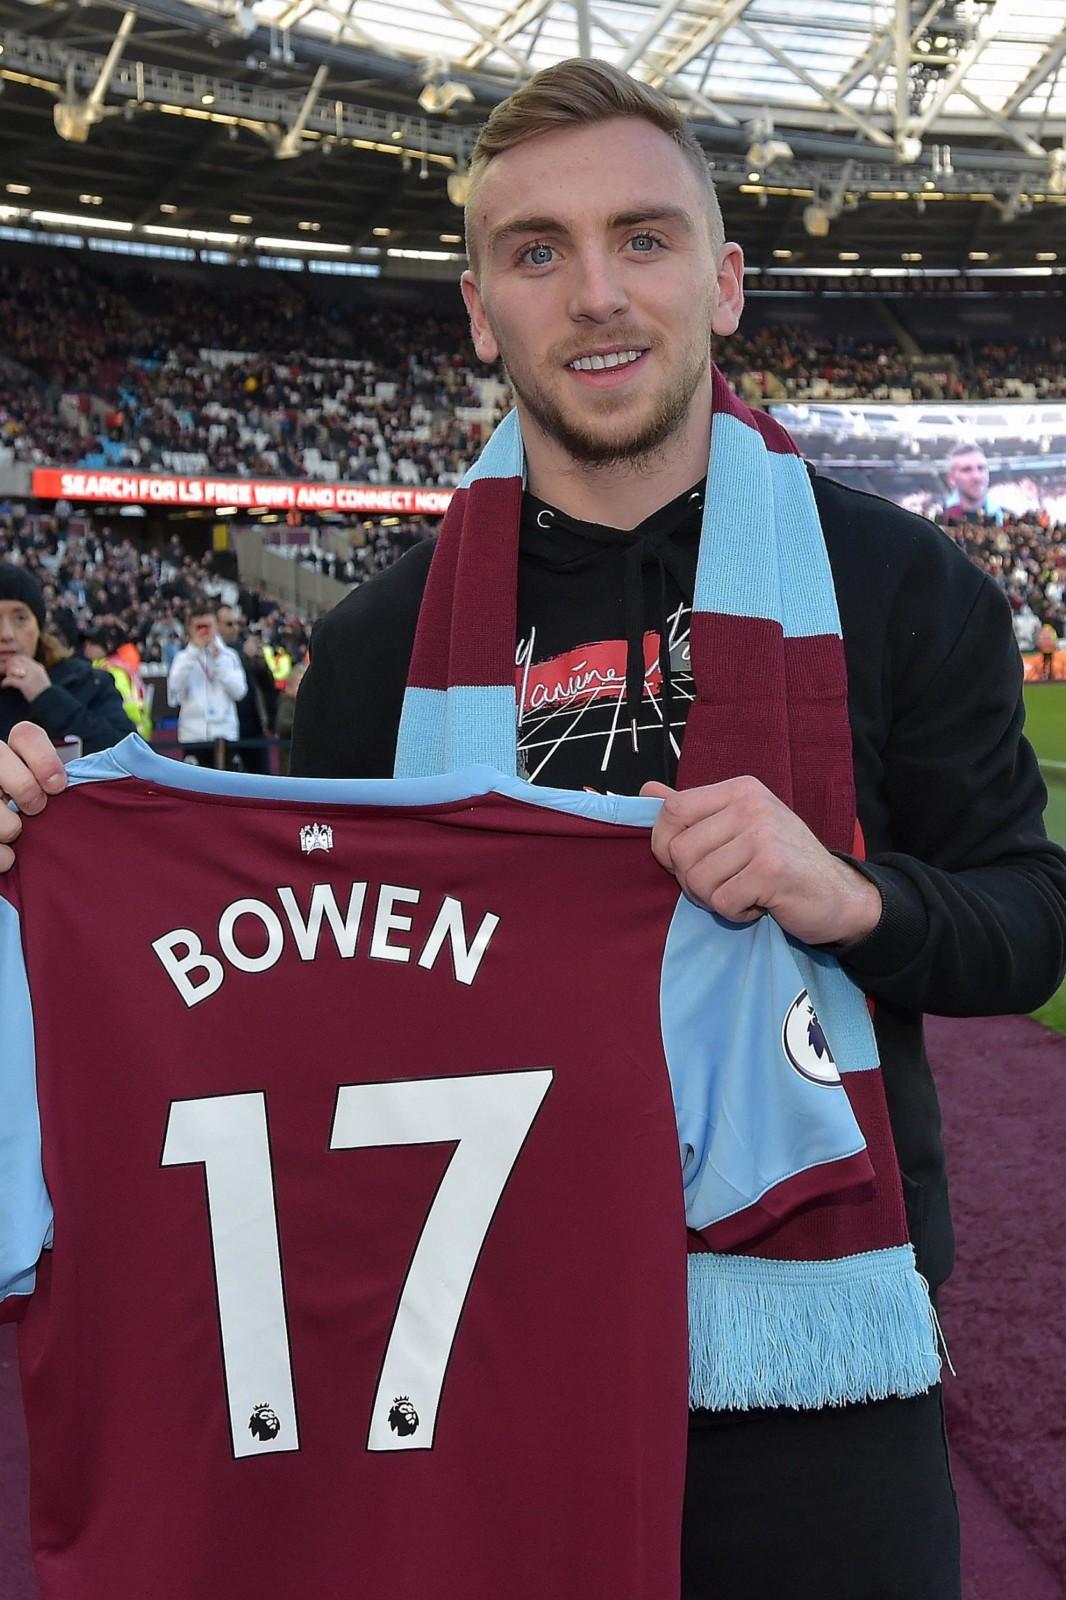 Jarrod Bowen – West Hams nye storscorer?